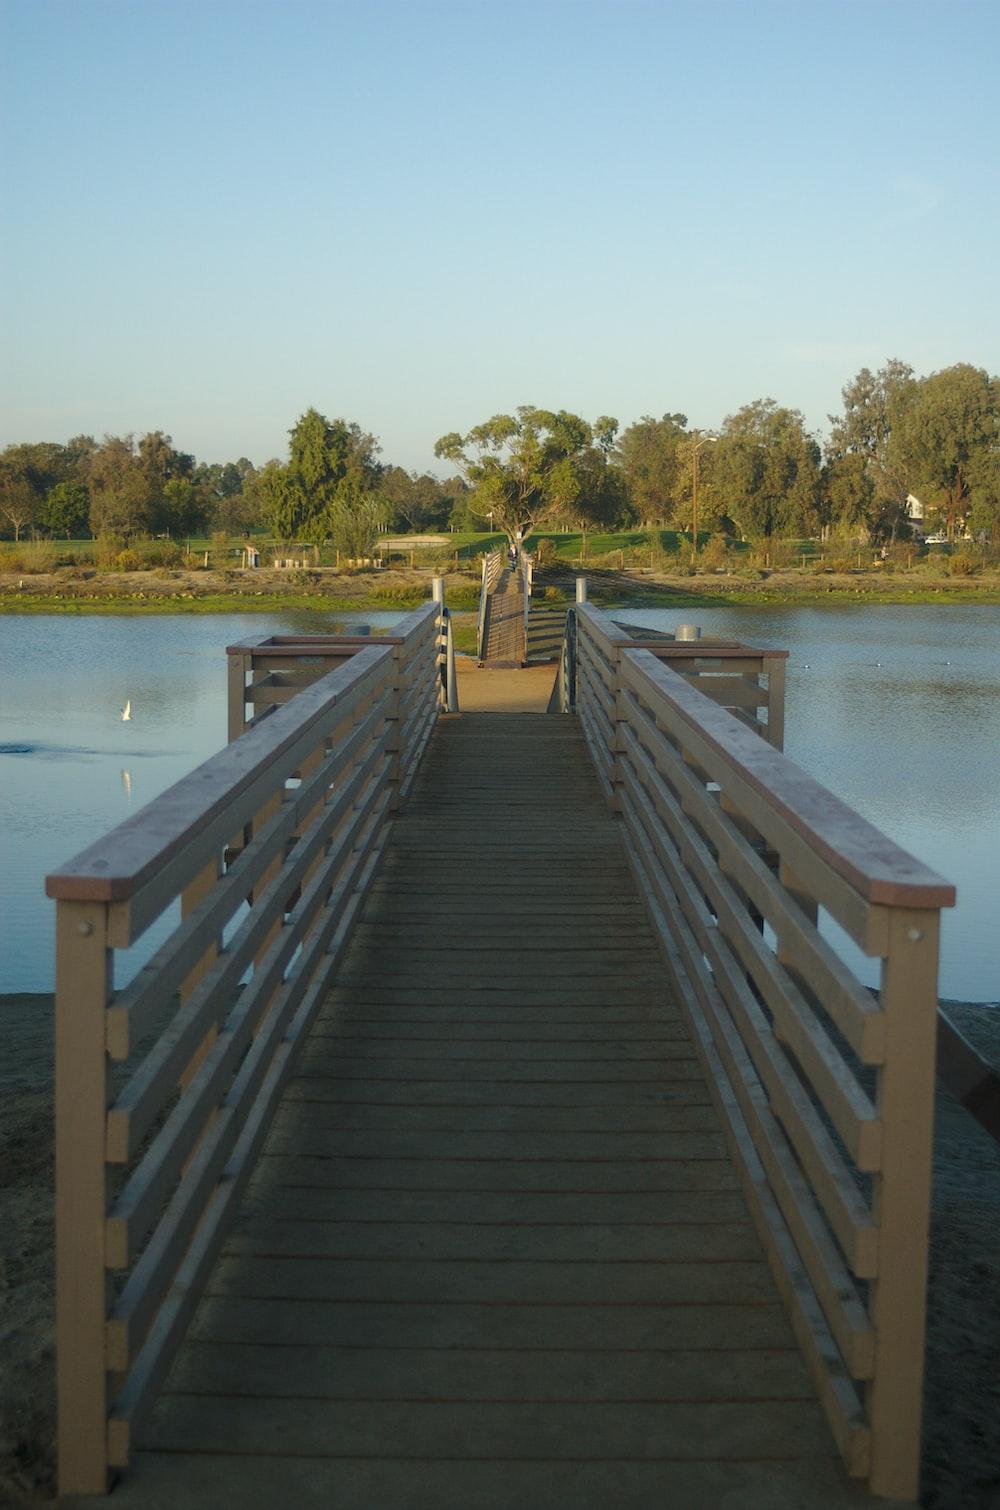 brown wooden dock at daytime